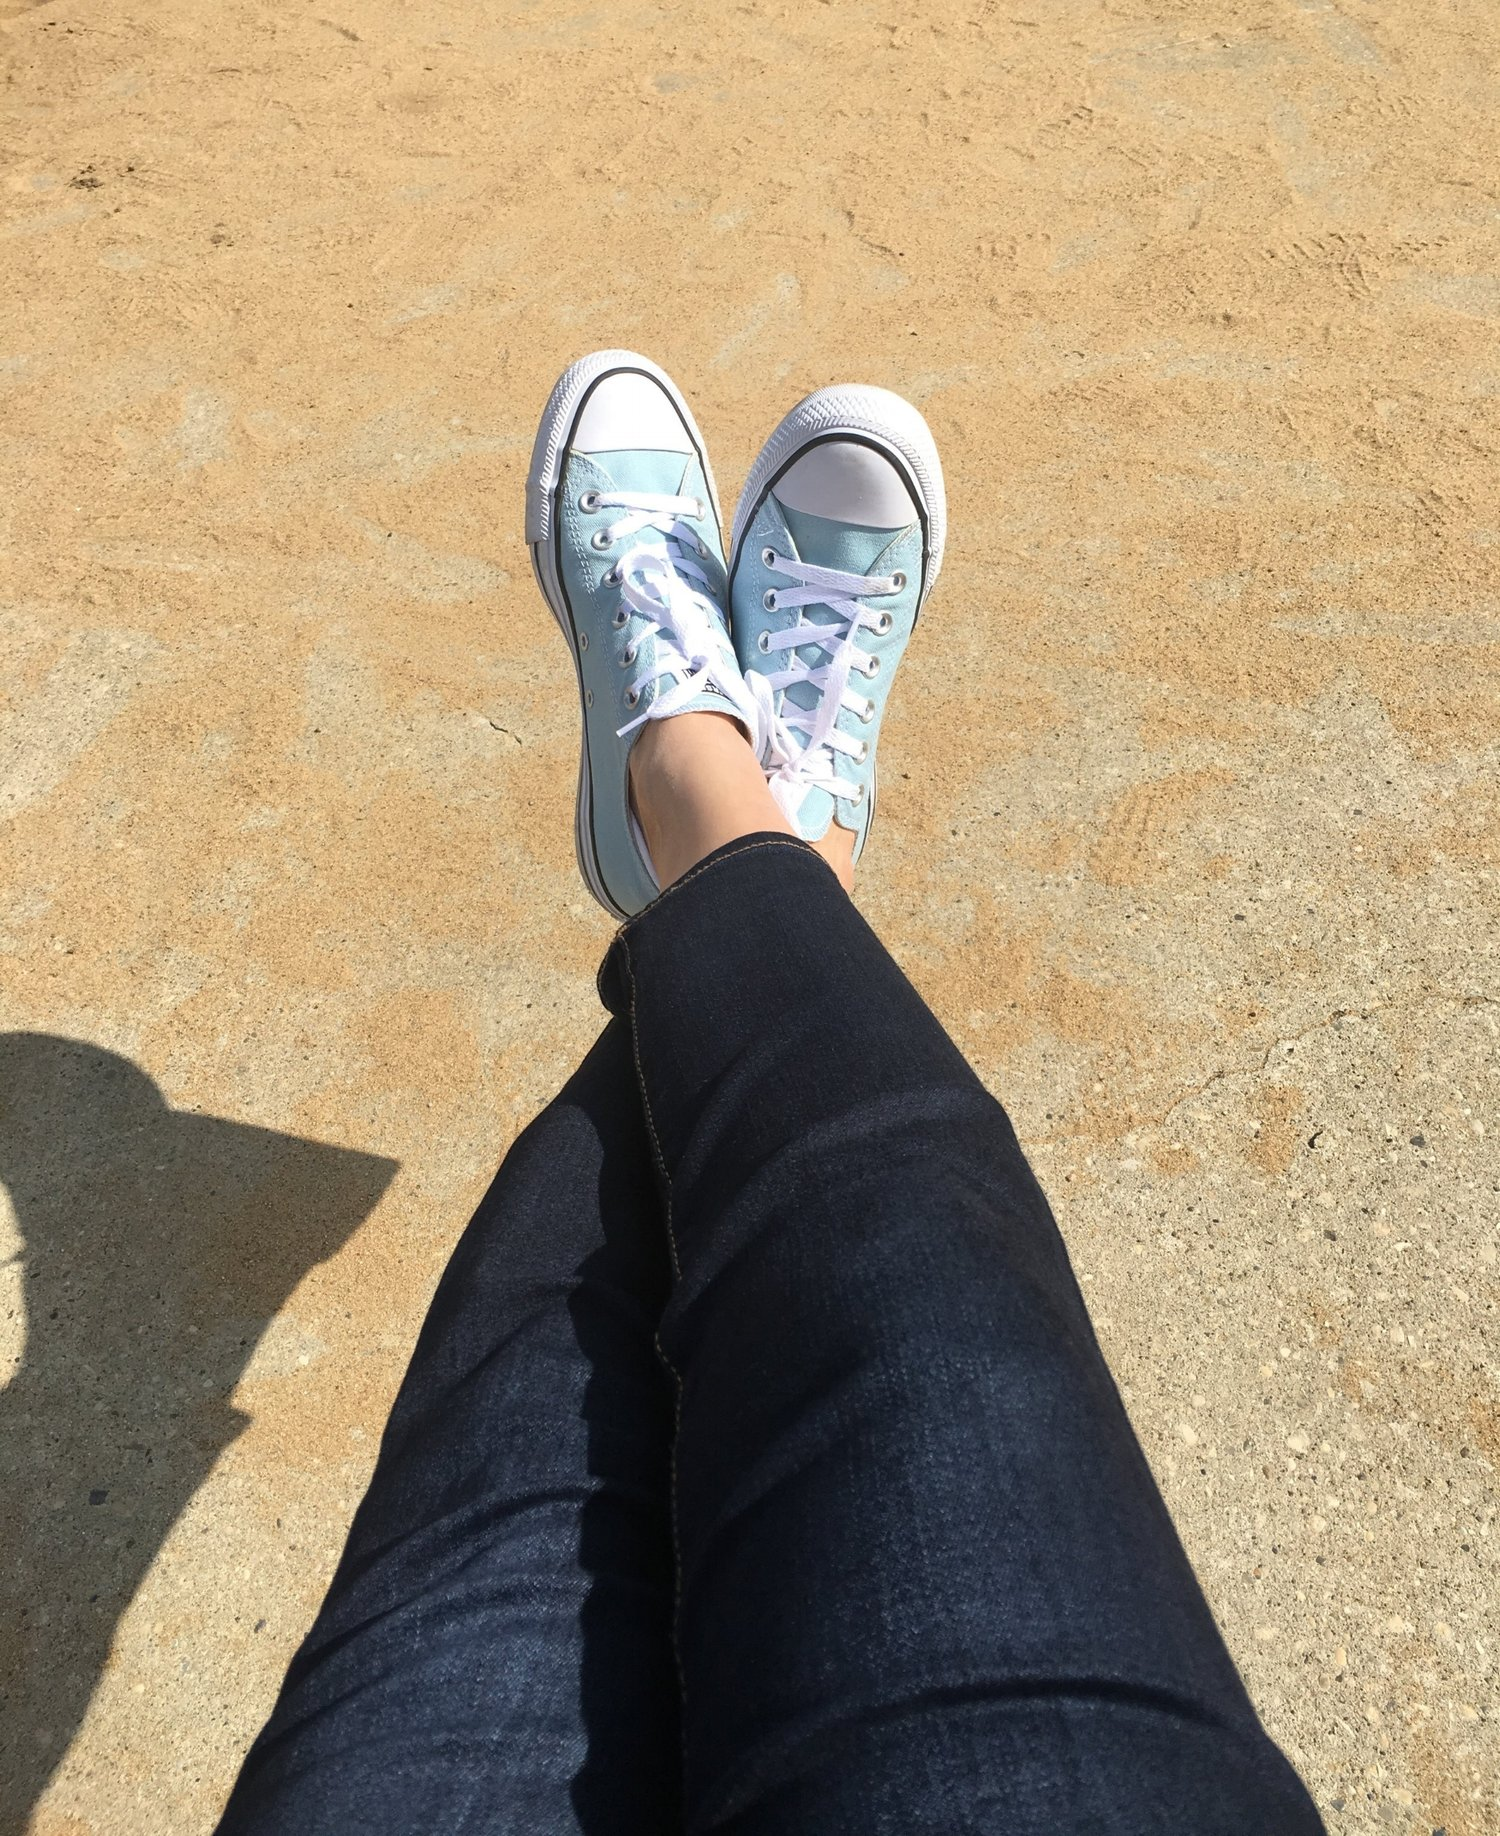 8154b8068584 Happy Feet - Kickin  It Old School The Fresh Sophisticate The Latest in  Fashion